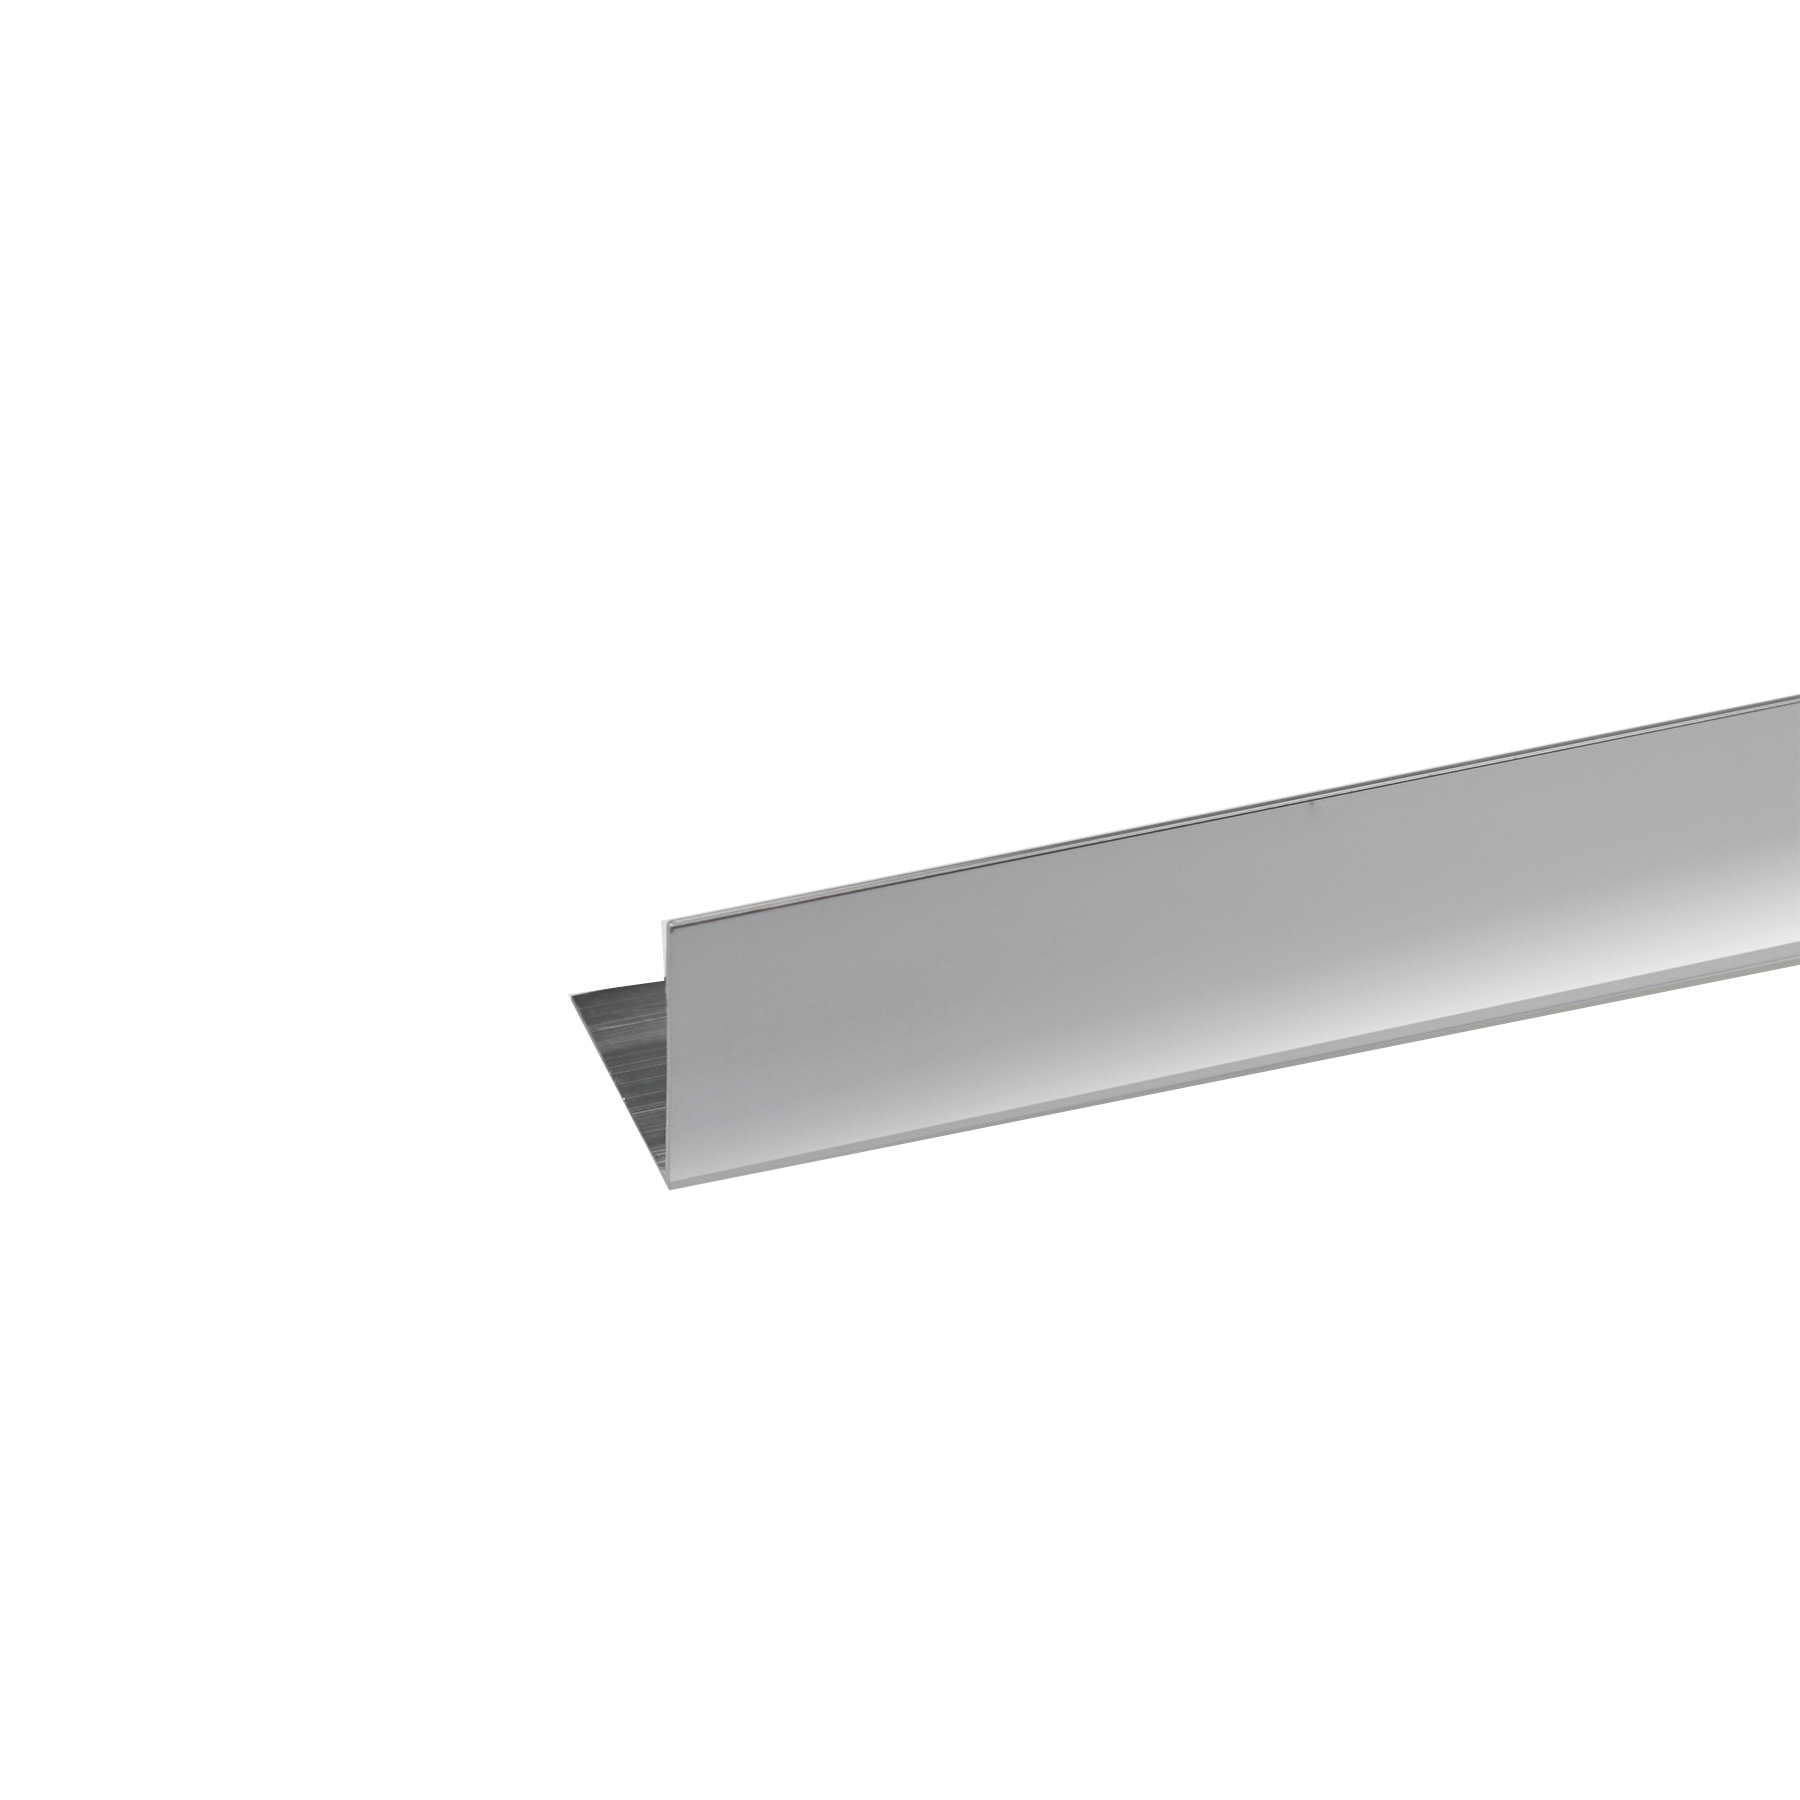 Perfil alum nio angular 1mx10x10mm brilhante leroy merlin for Perfil u aluminio leroy merlin